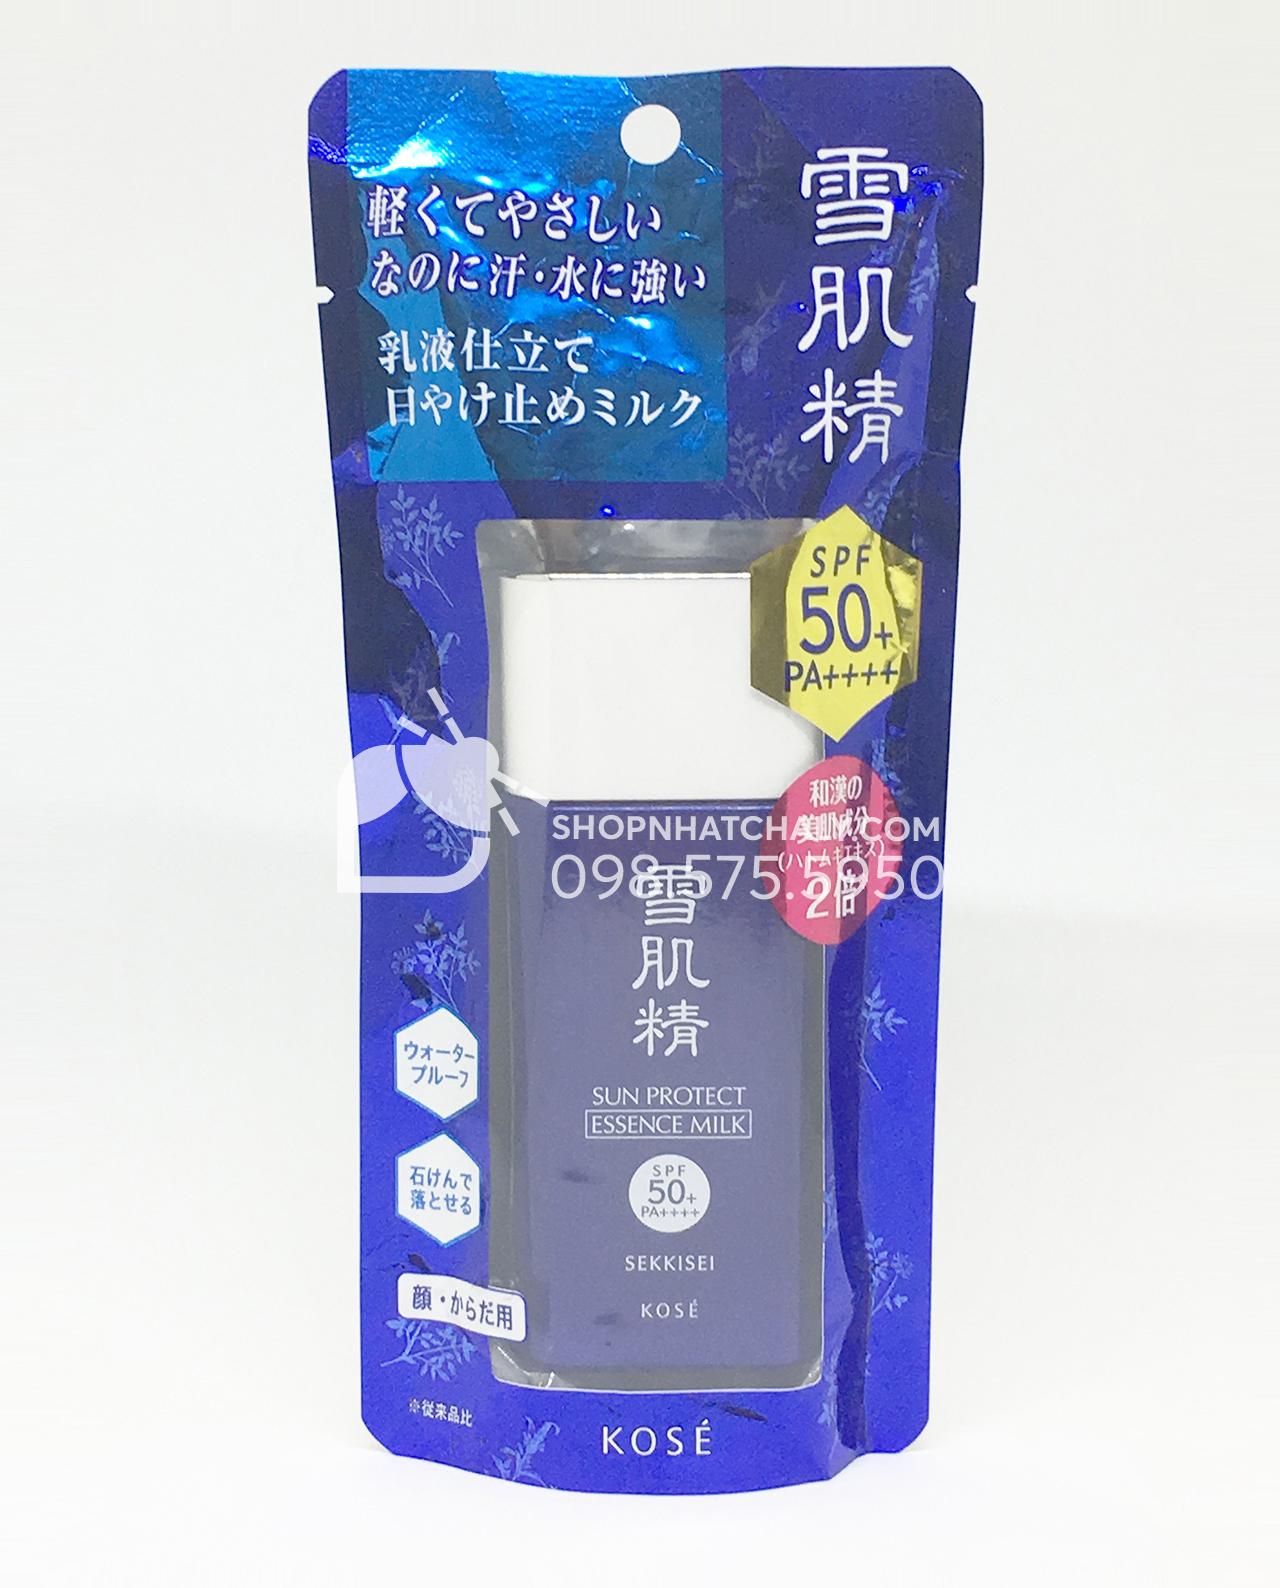 Kem chống nắng Kose dạng milk Sekkisei Sun Protect Essence Milk SPF 50 60gr